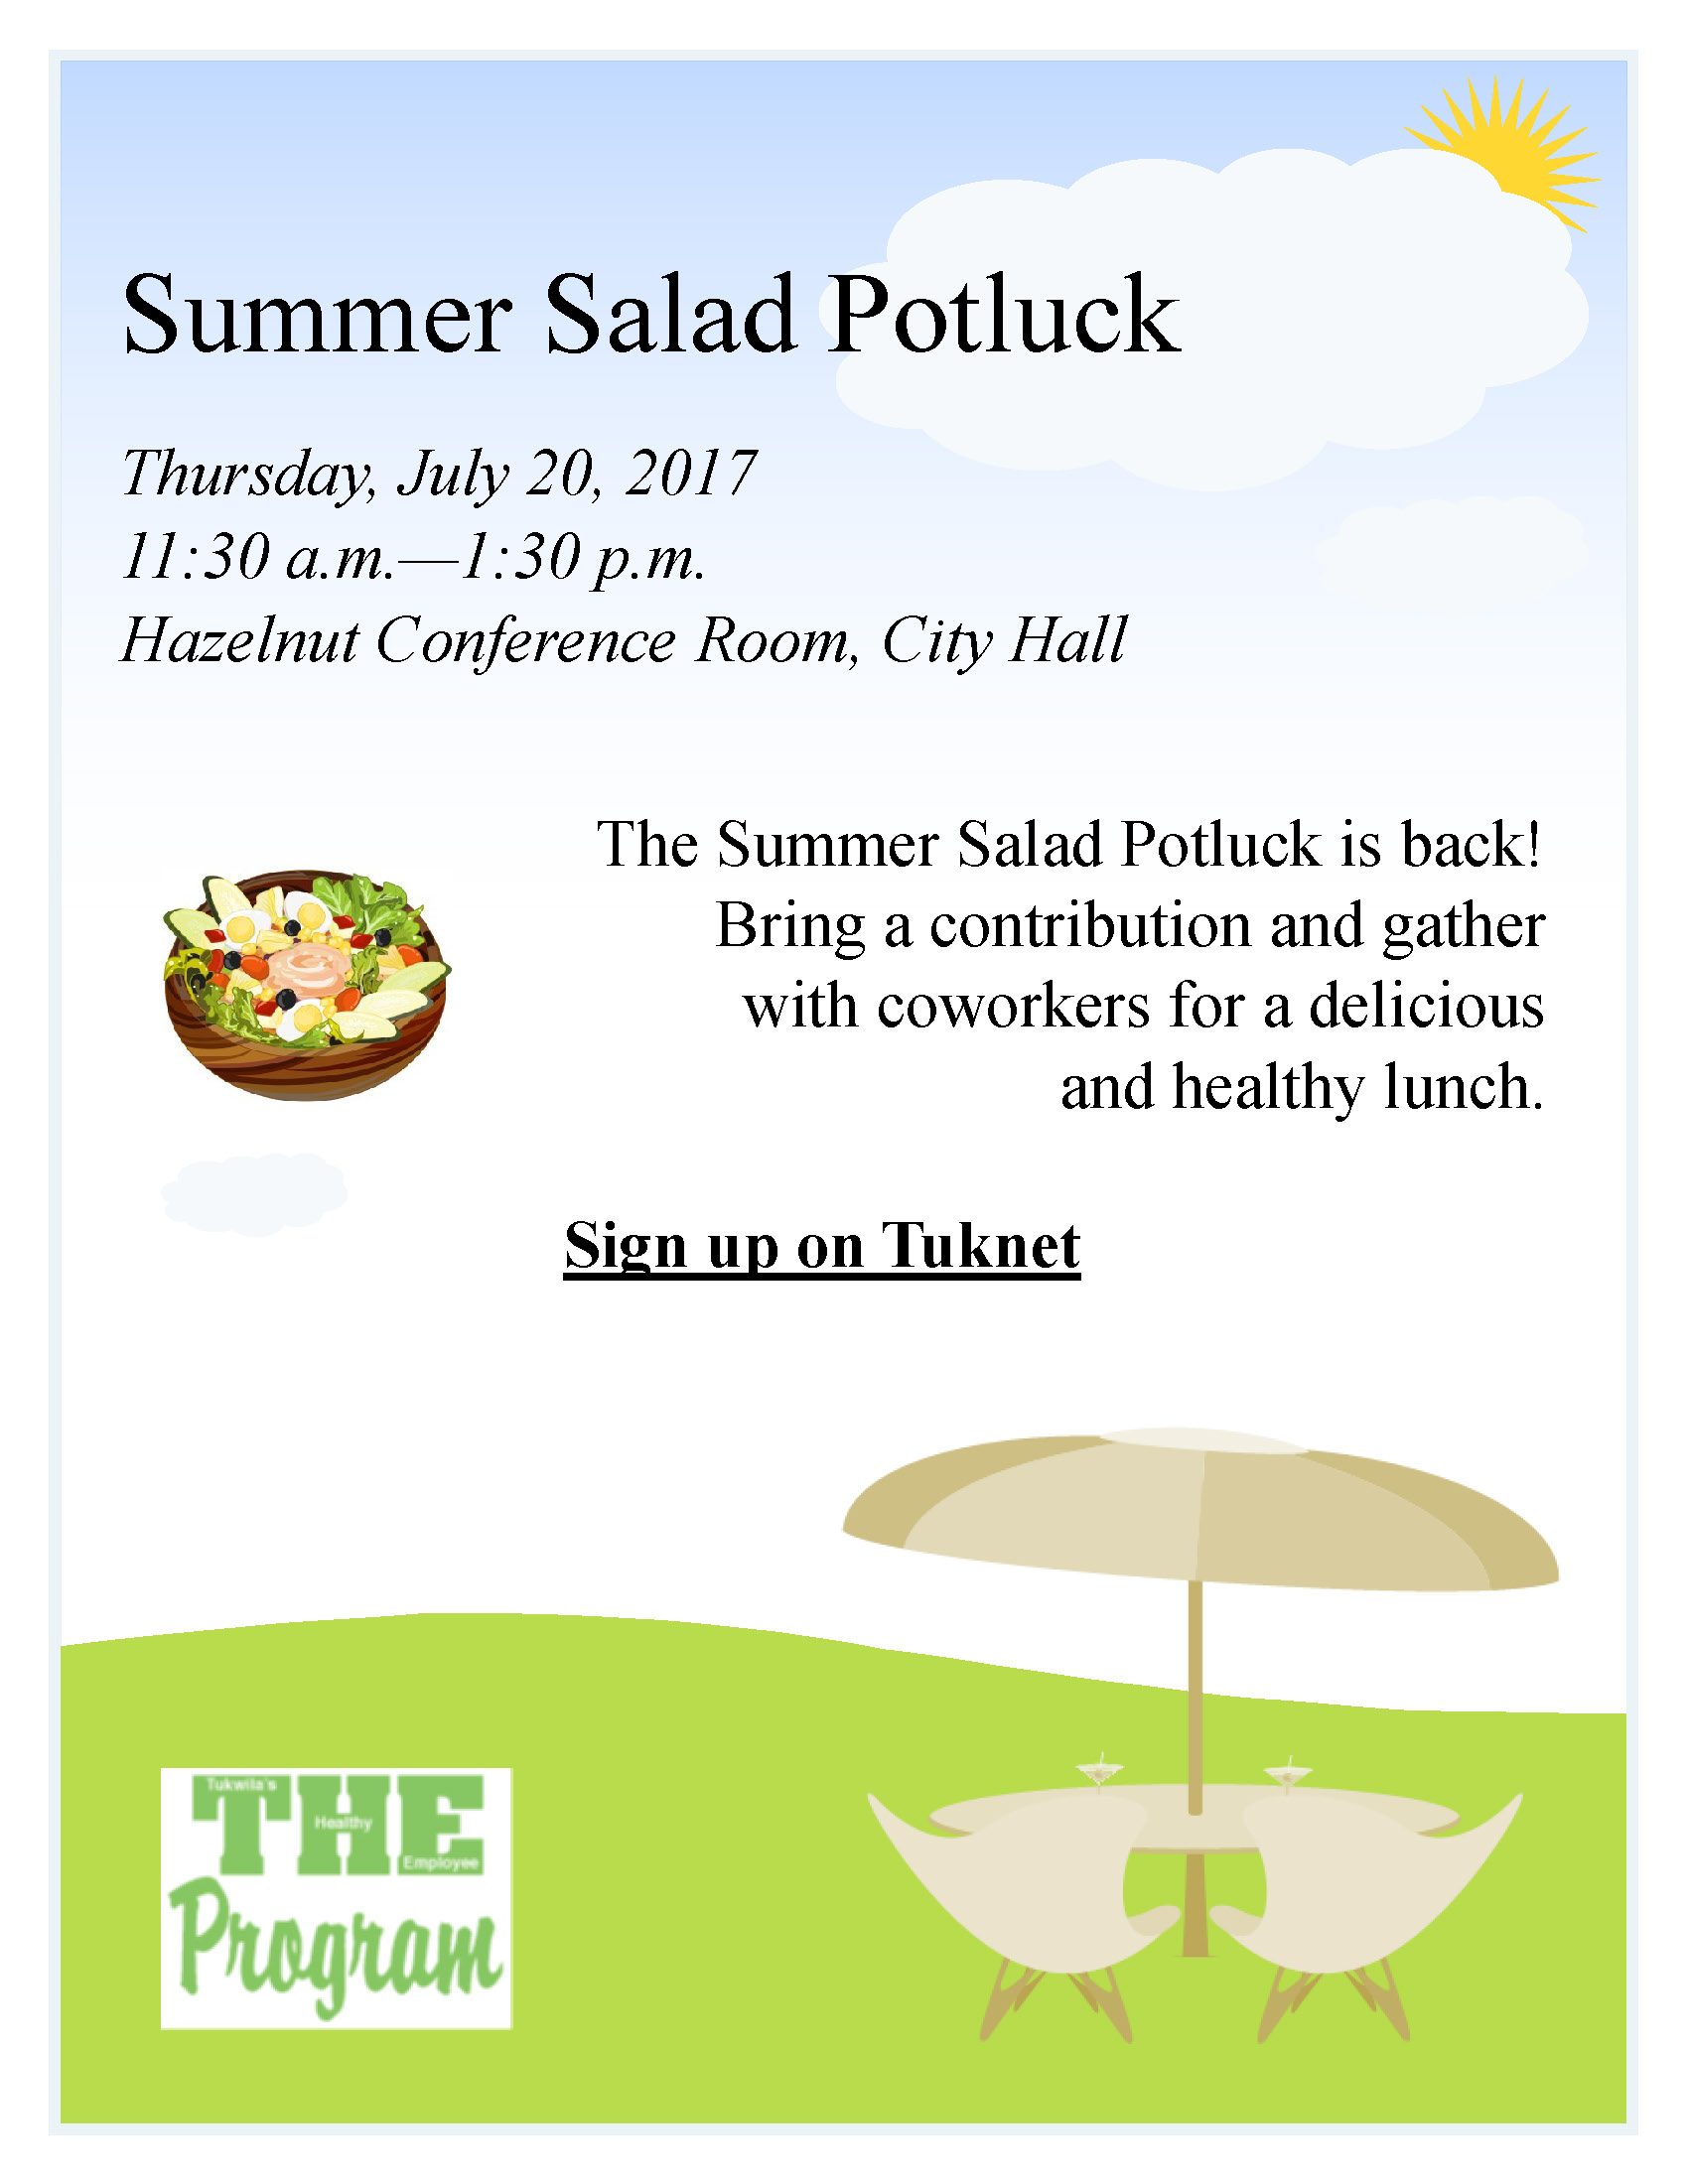 tuknet summer salad potluck flyer city of tukwila